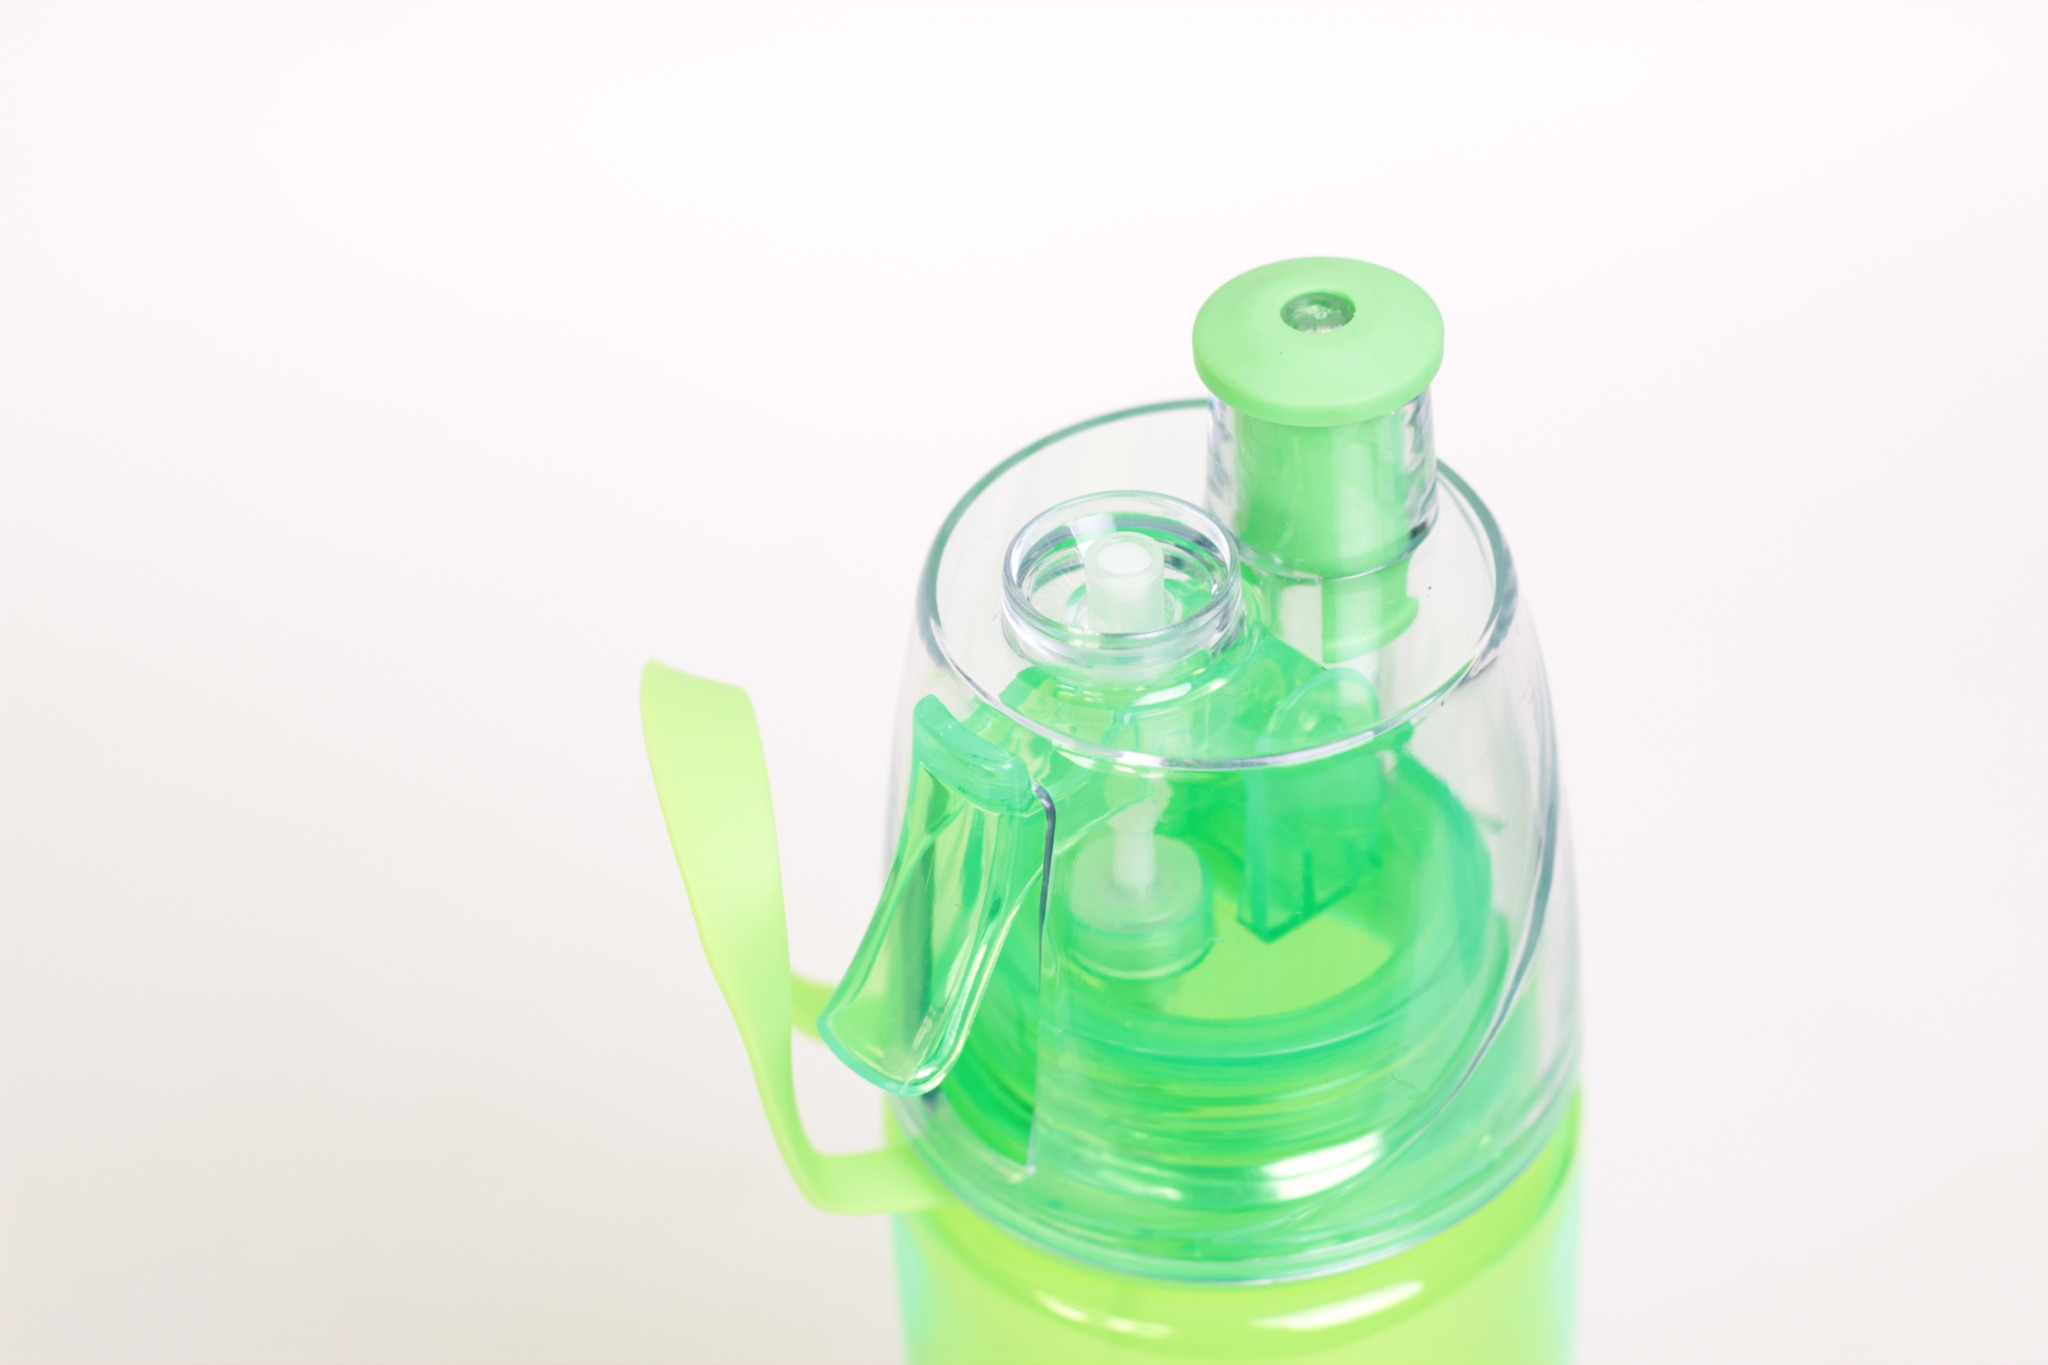 Бутылка для воды с распылителем 570 мл. Kamille зеленая